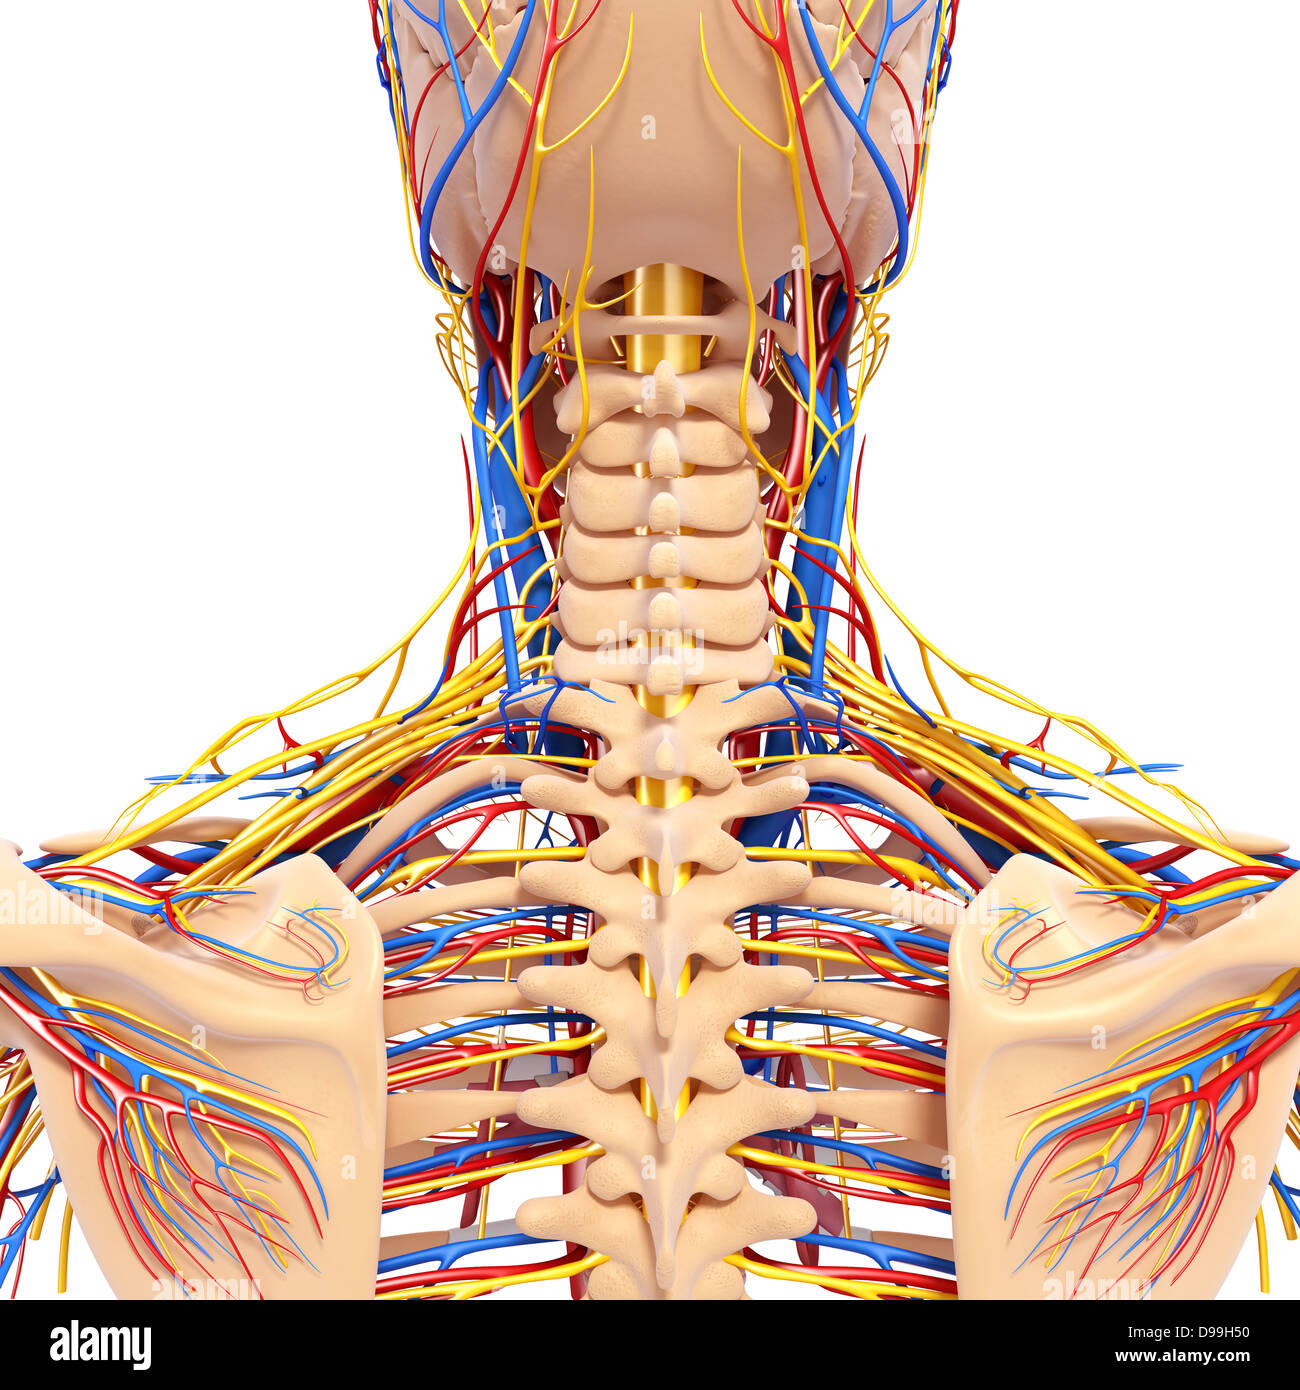 Arteries Stockfotos & Arteries Bilder - Seite 3 - Alamy